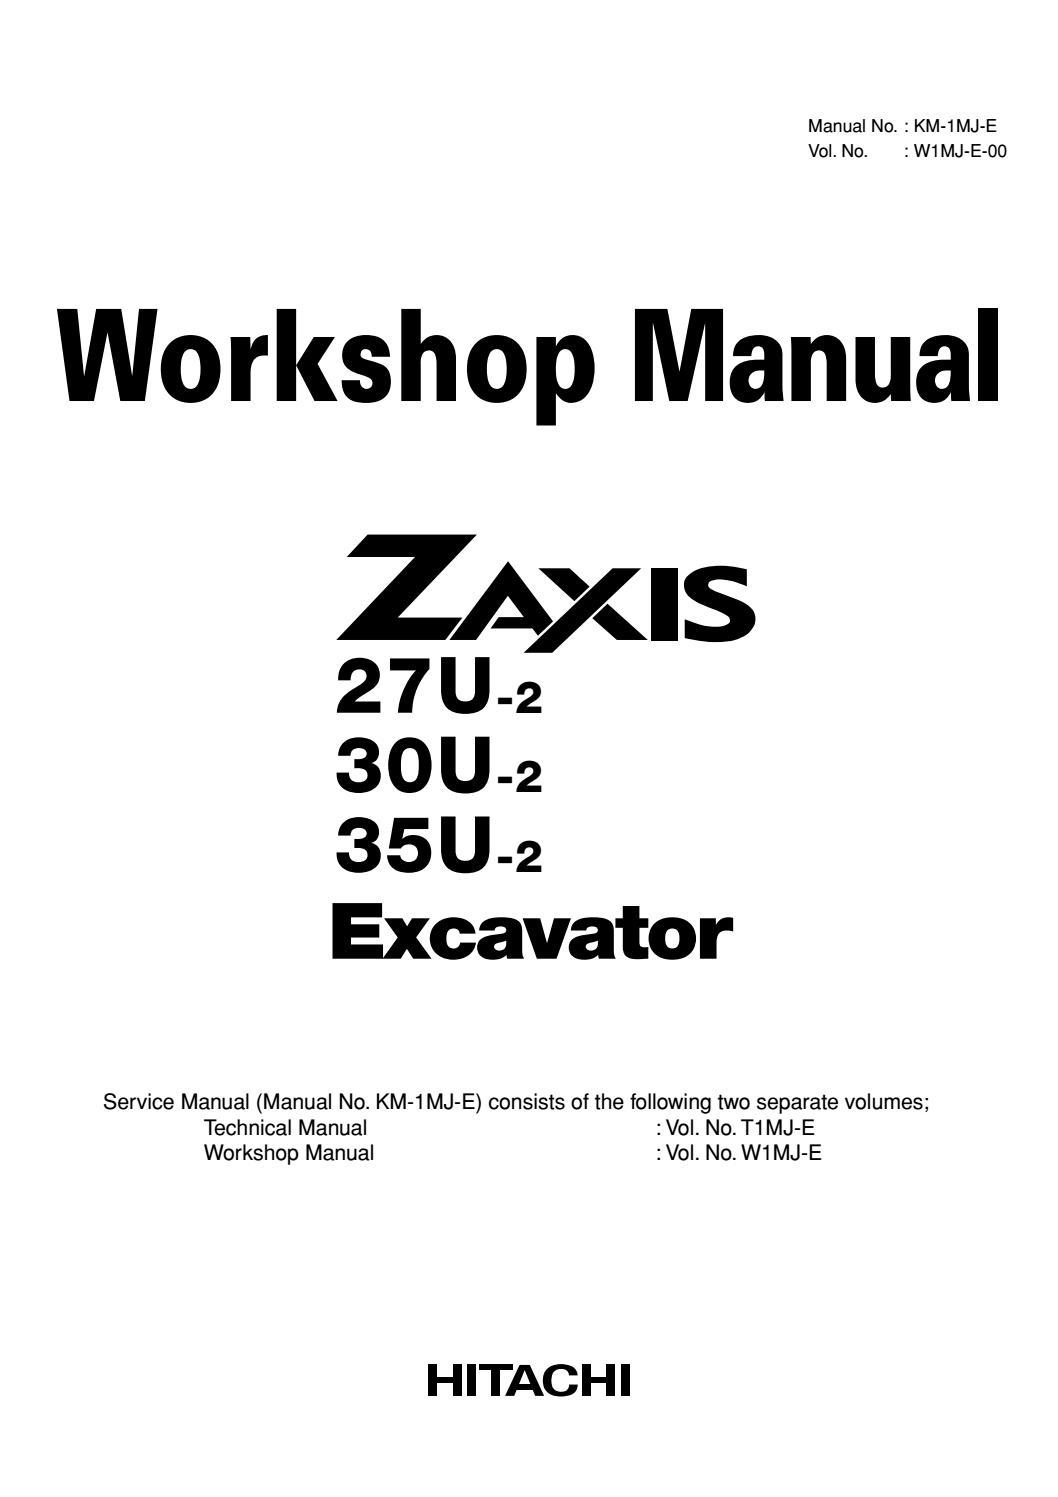 Hitachi zaxis 30u 2 excavator service repair manual by